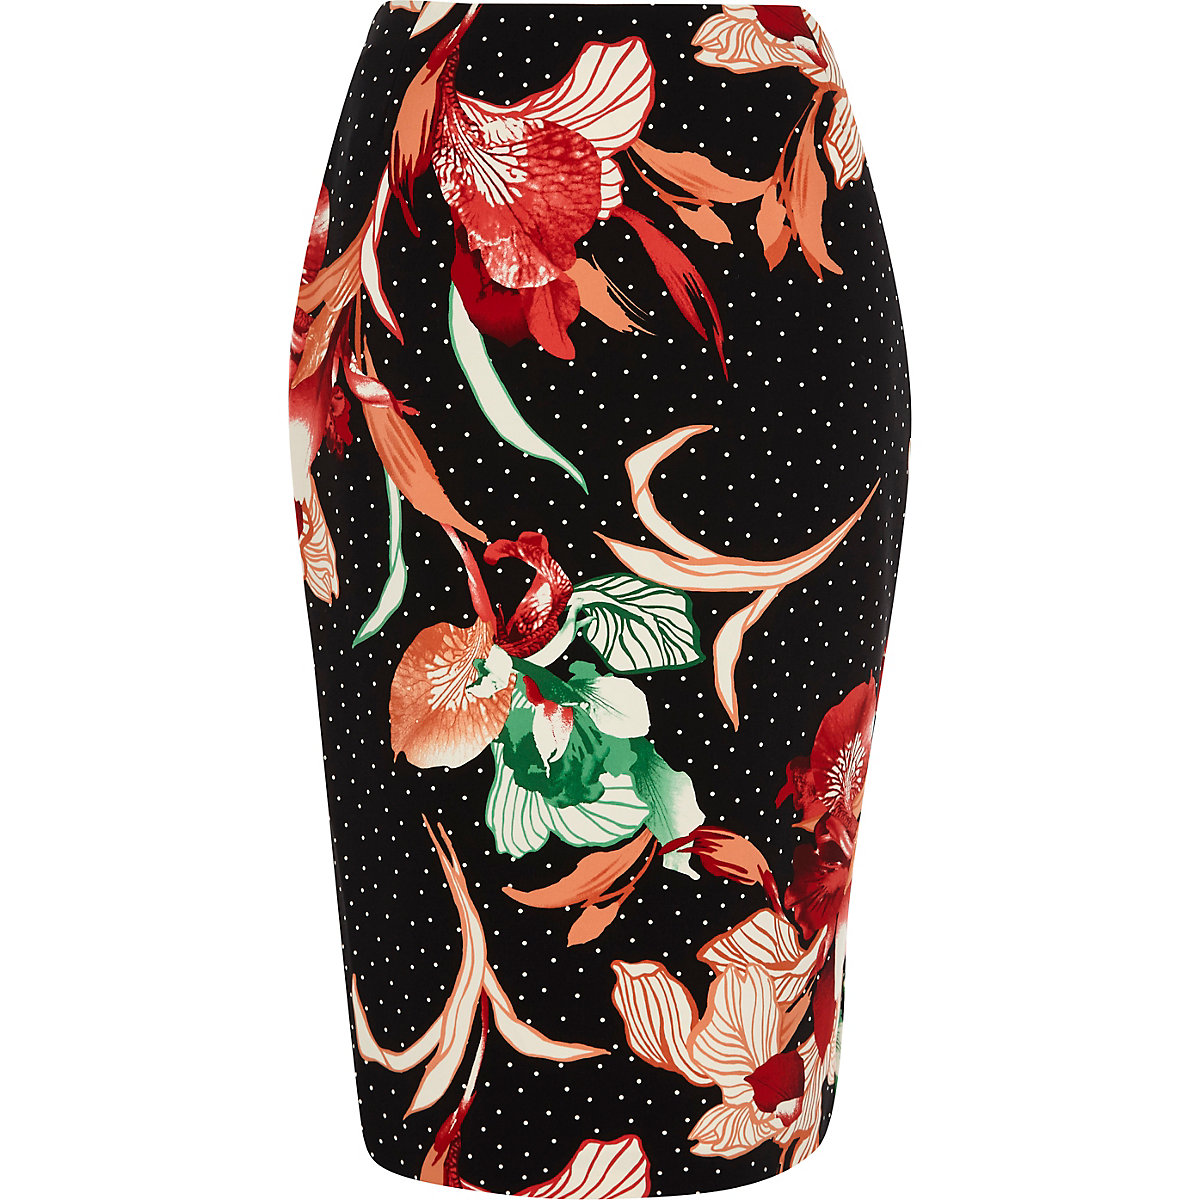 Black floral polka dot print pencil skirt